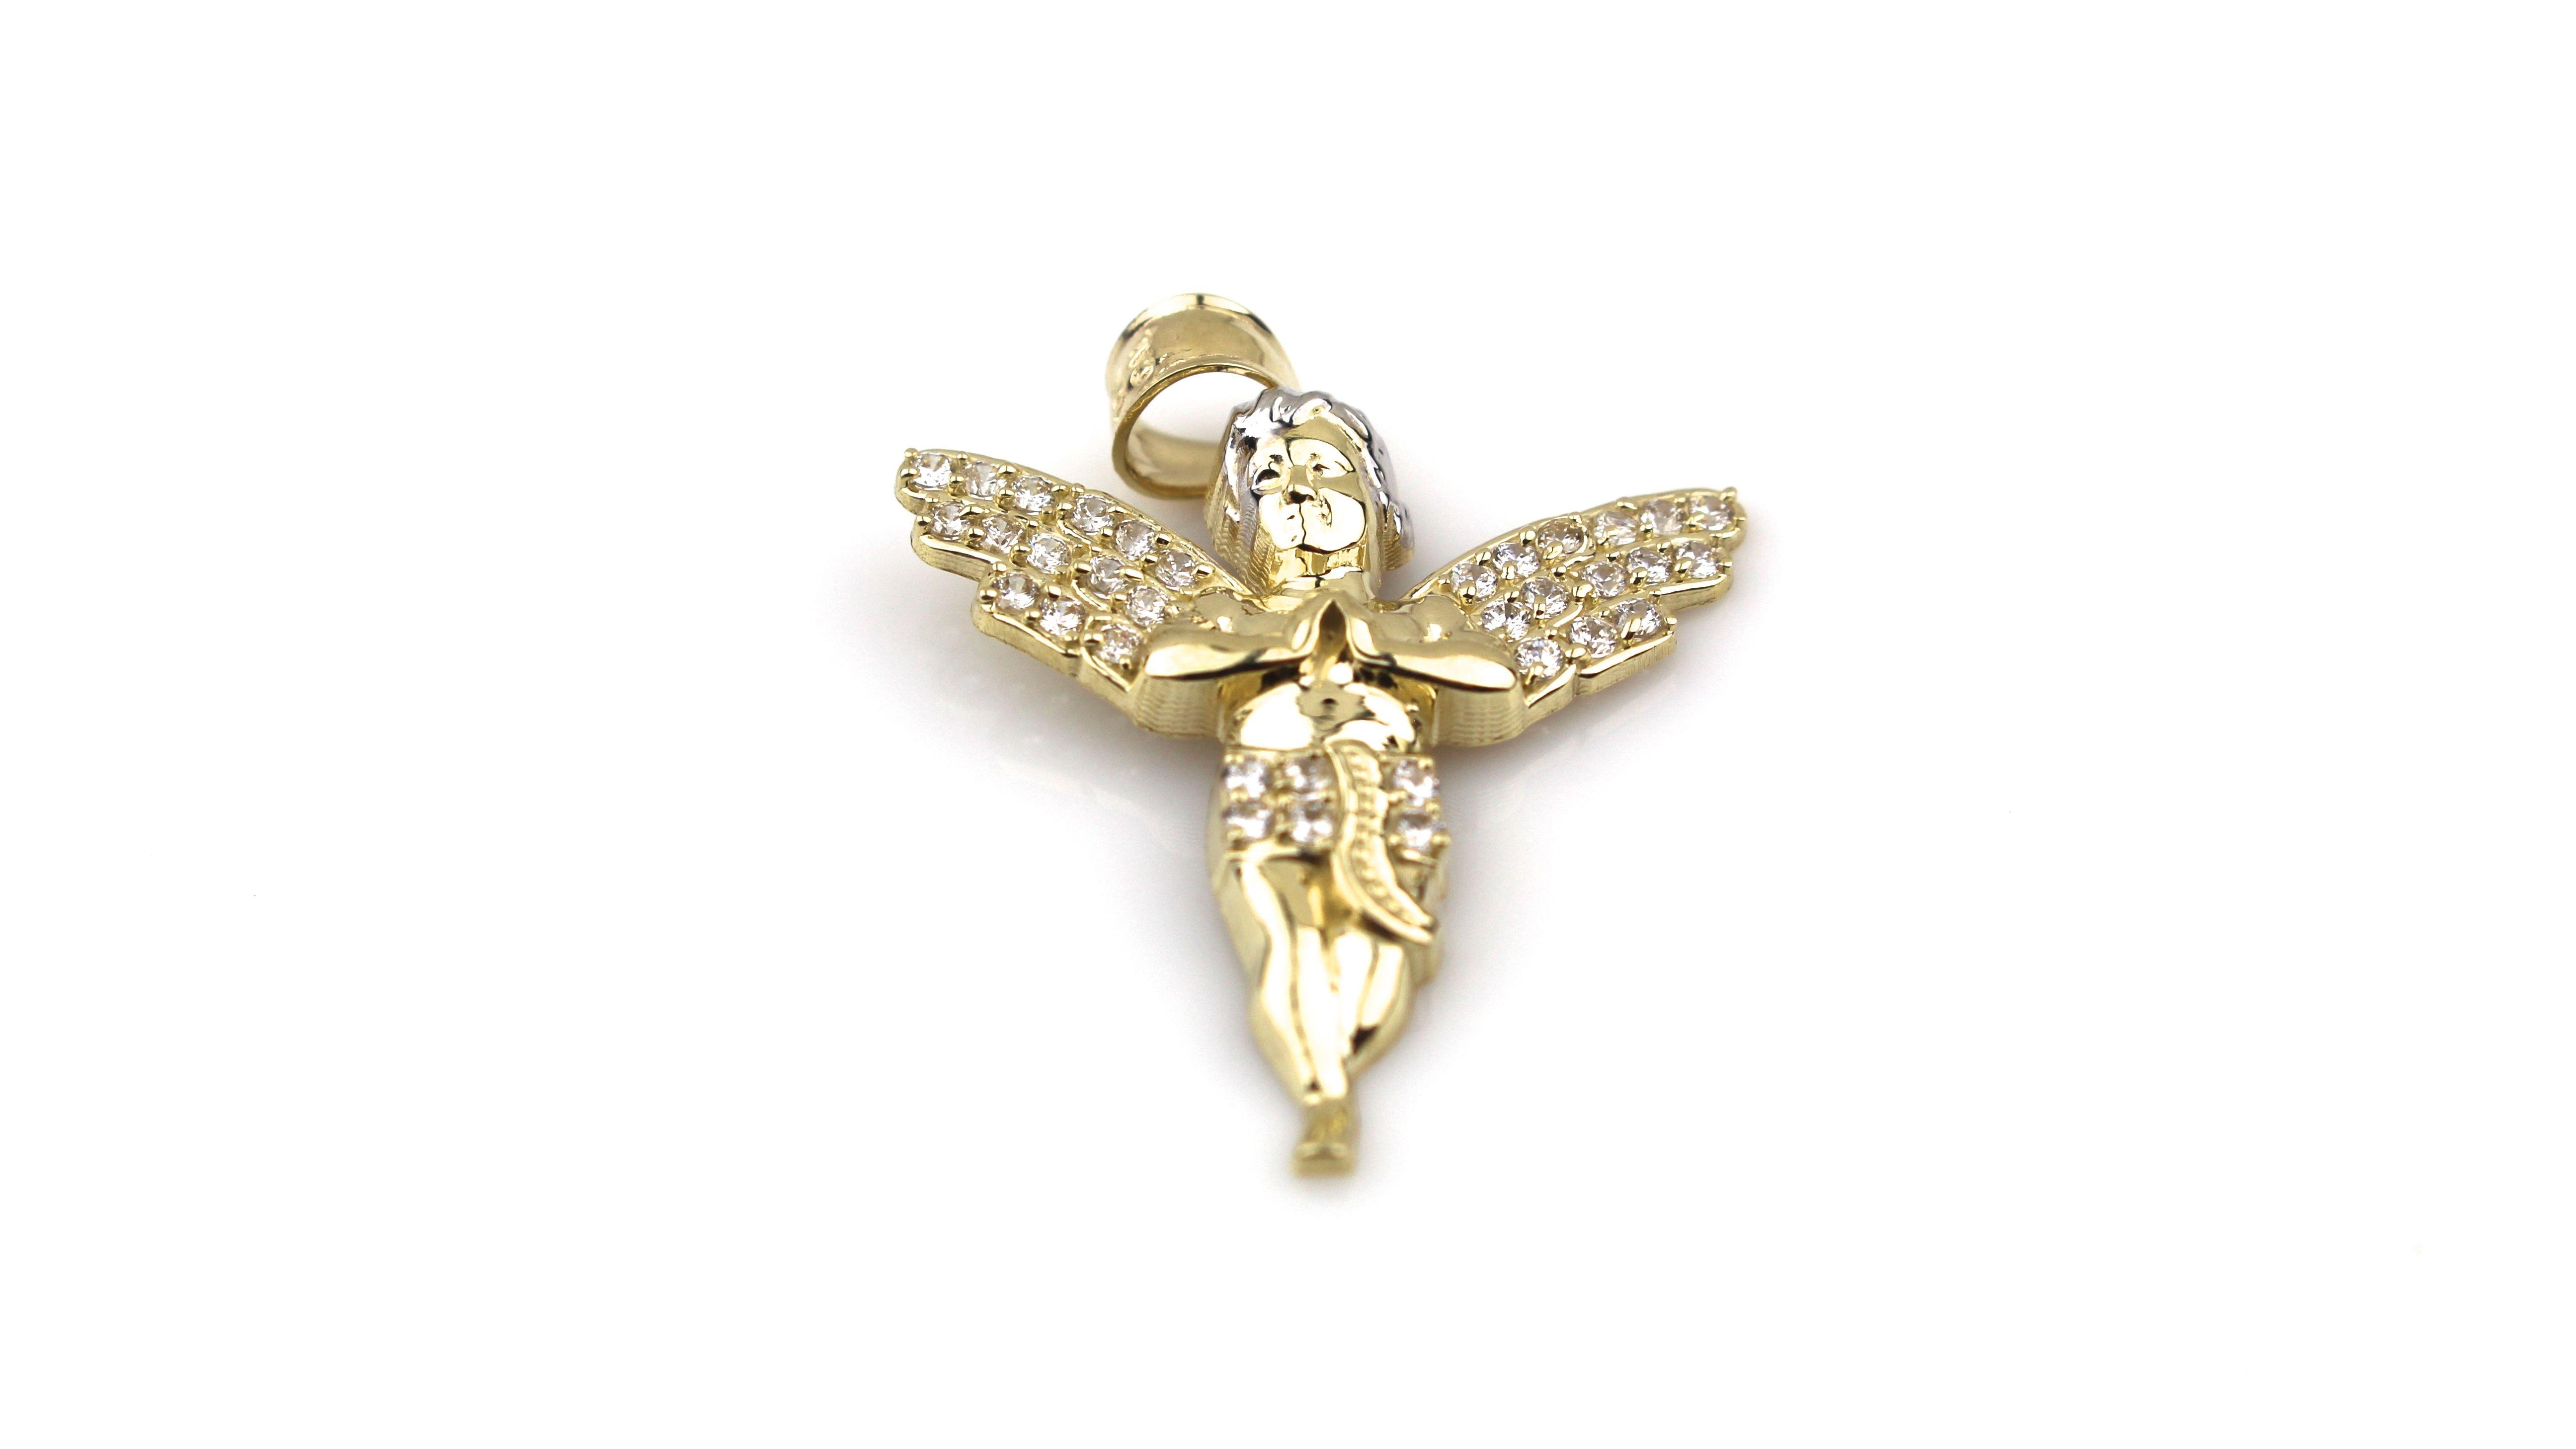 10 Karat Gold Angel Charm Angelic isnt it 10 Karat Gold